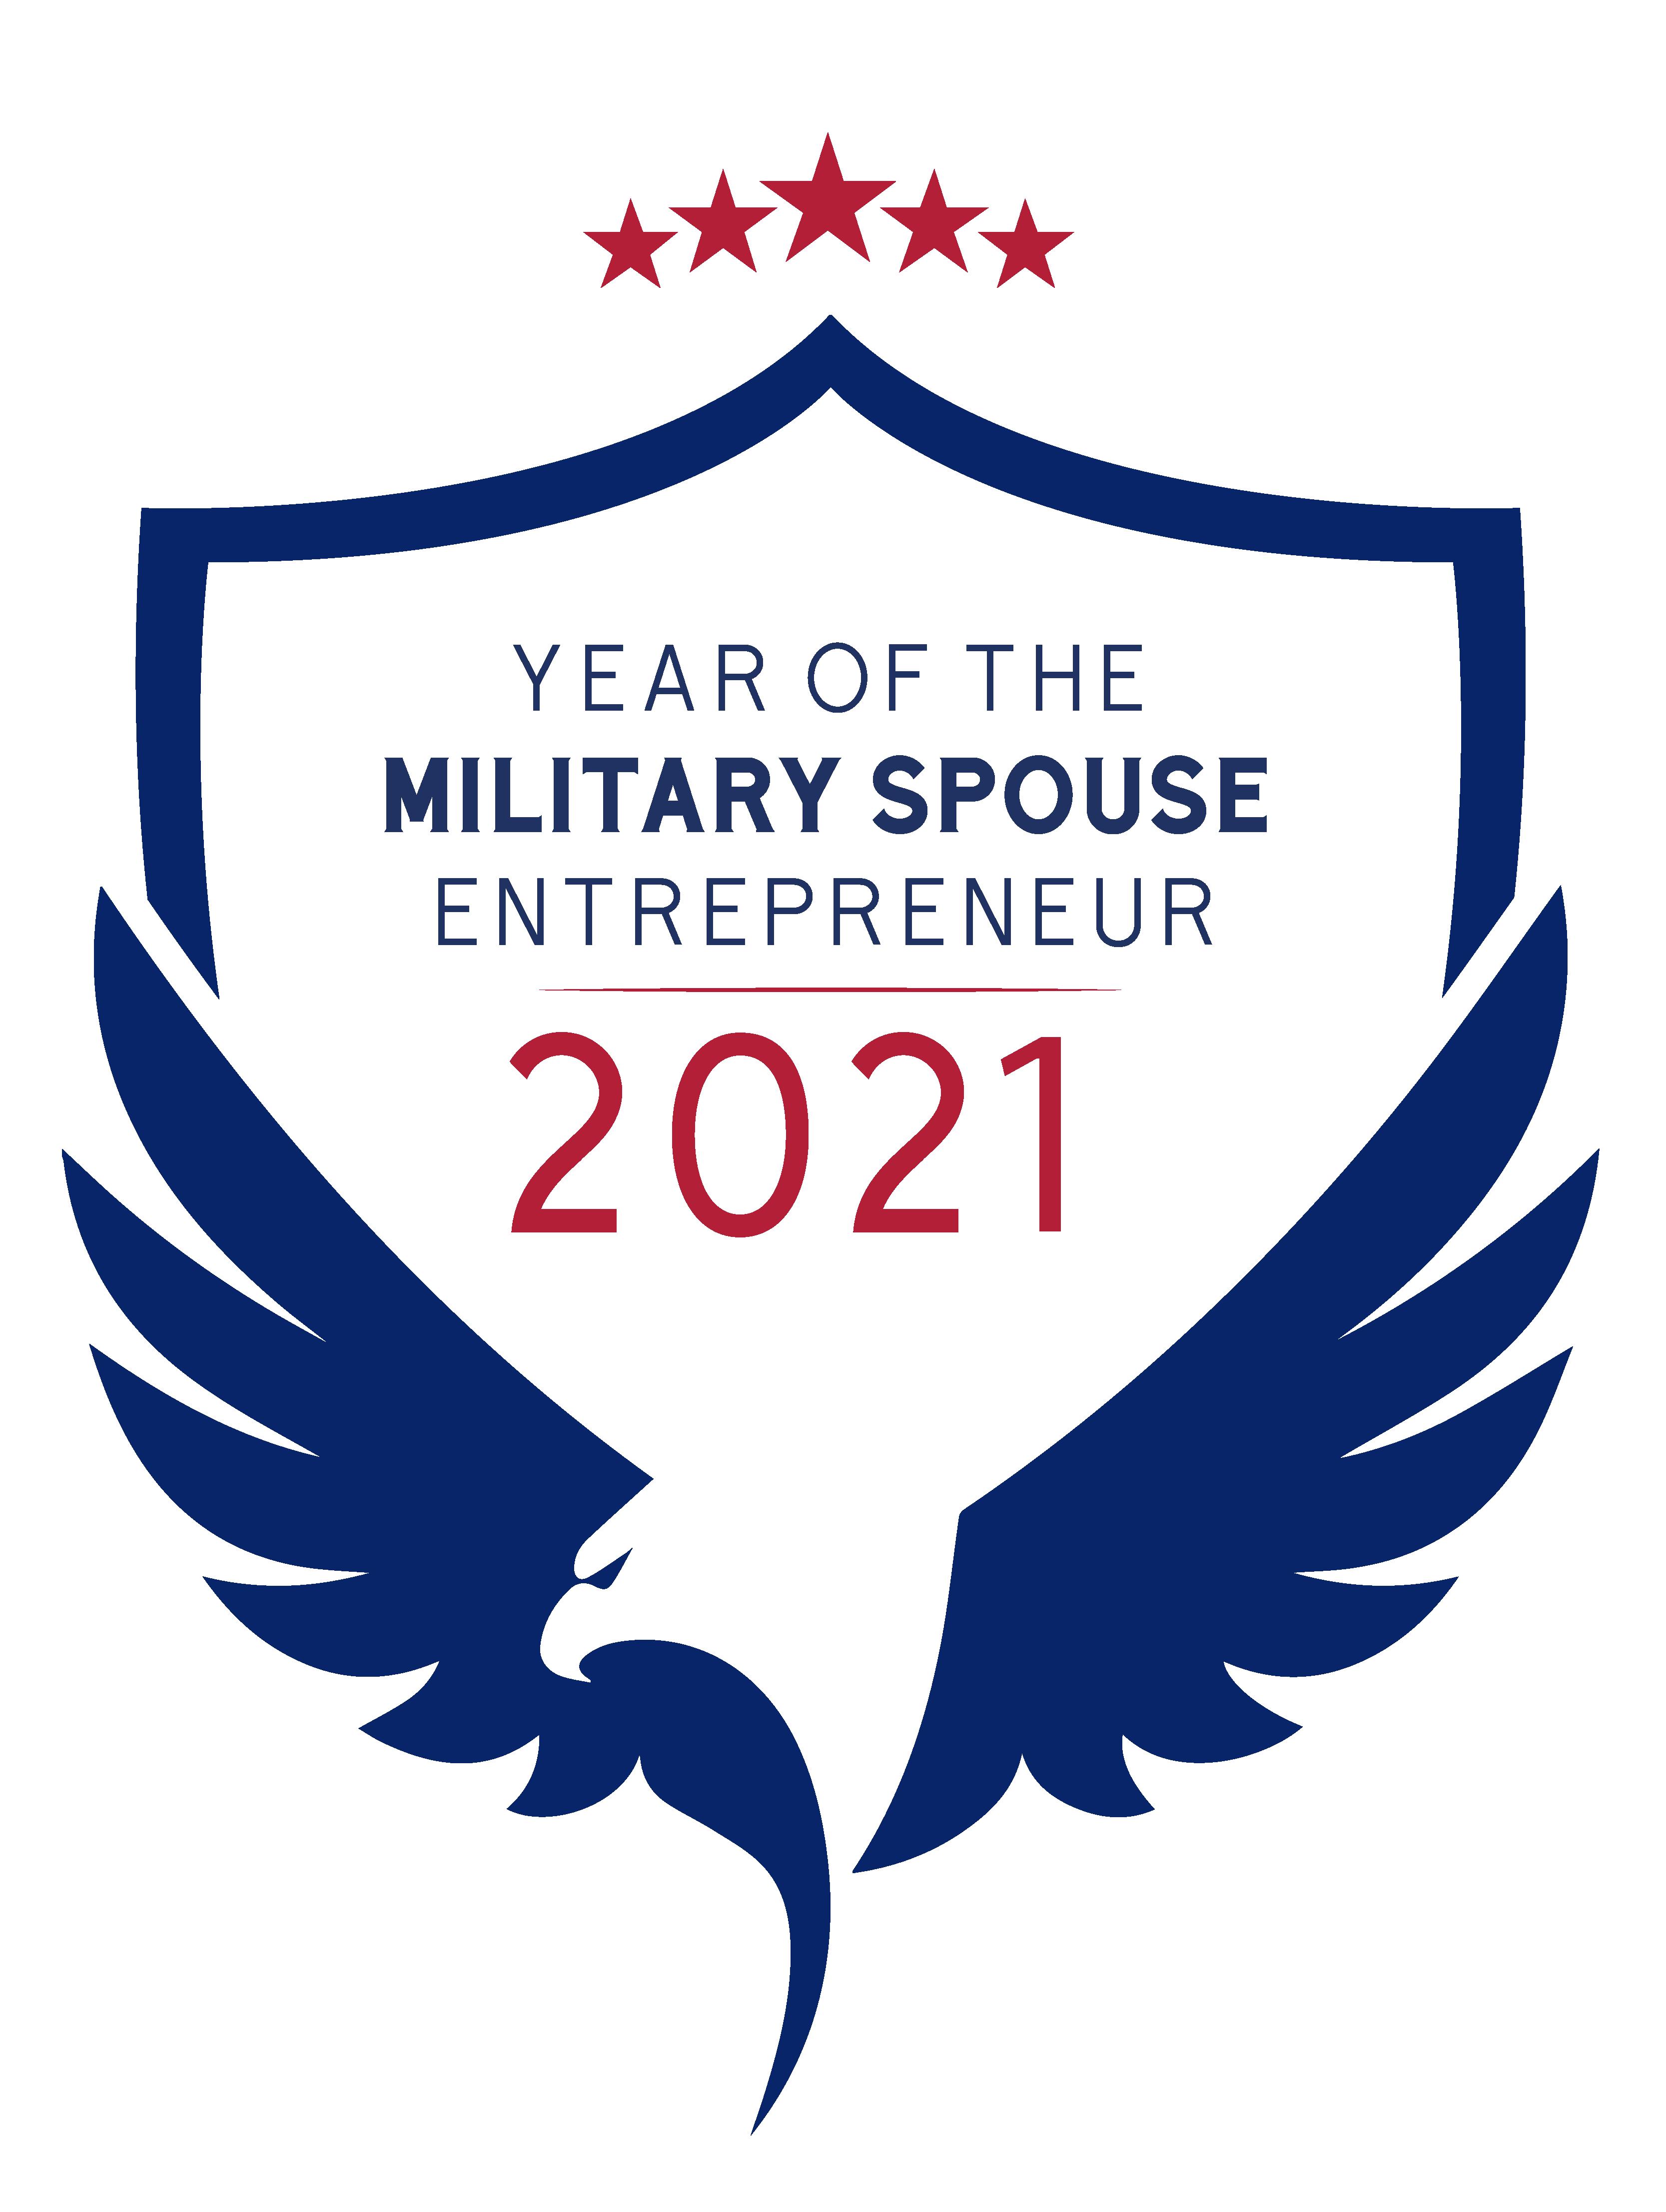 2021 Year of the Military Spouse Entrepreneur Logo